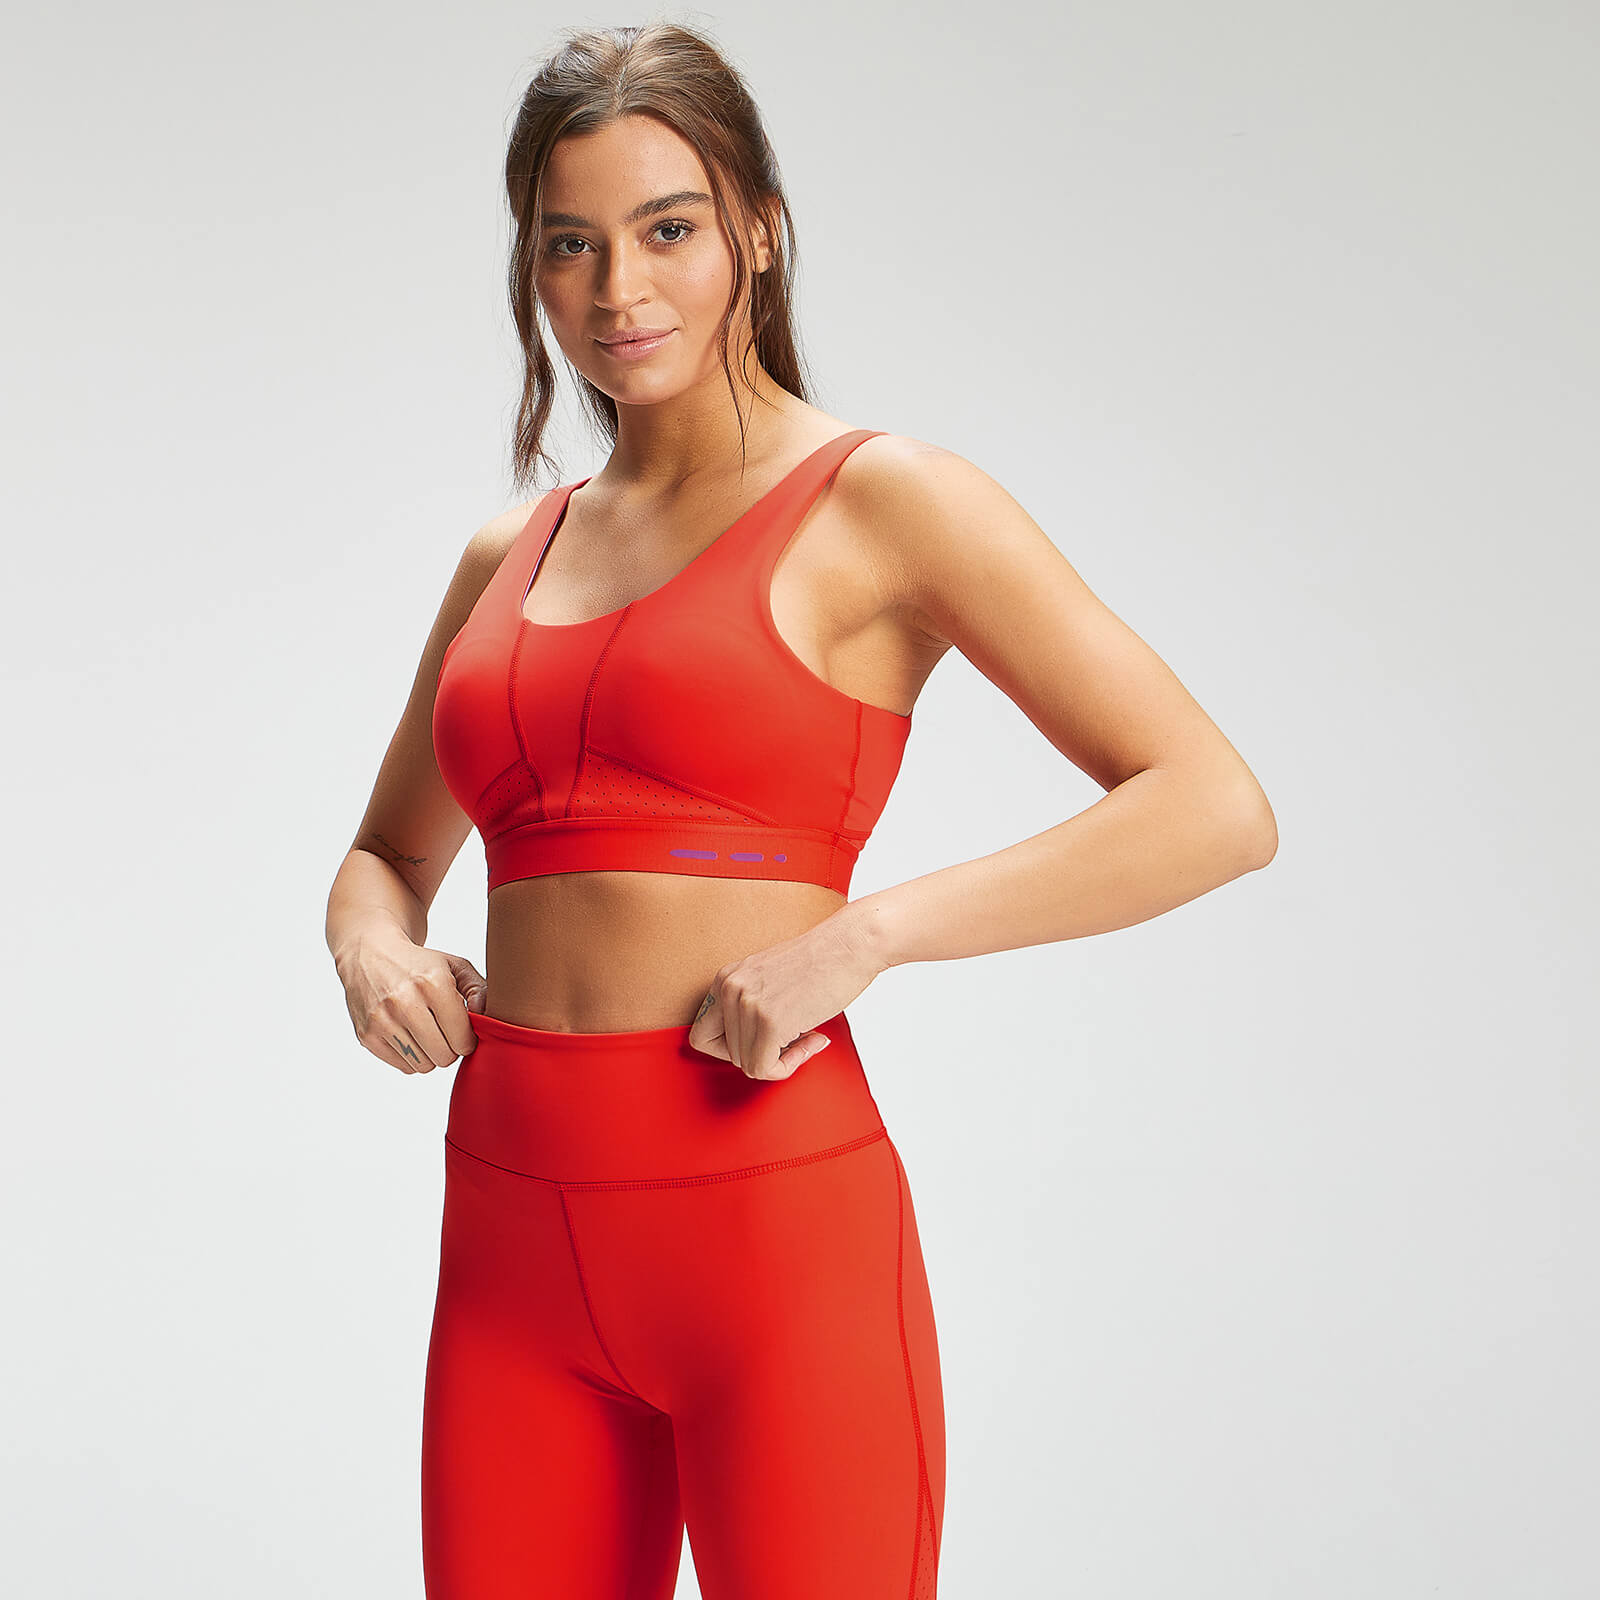 Купить MP Women's Power Ultra Sports Bra - Fire/Orchid - XL, Myprotein International